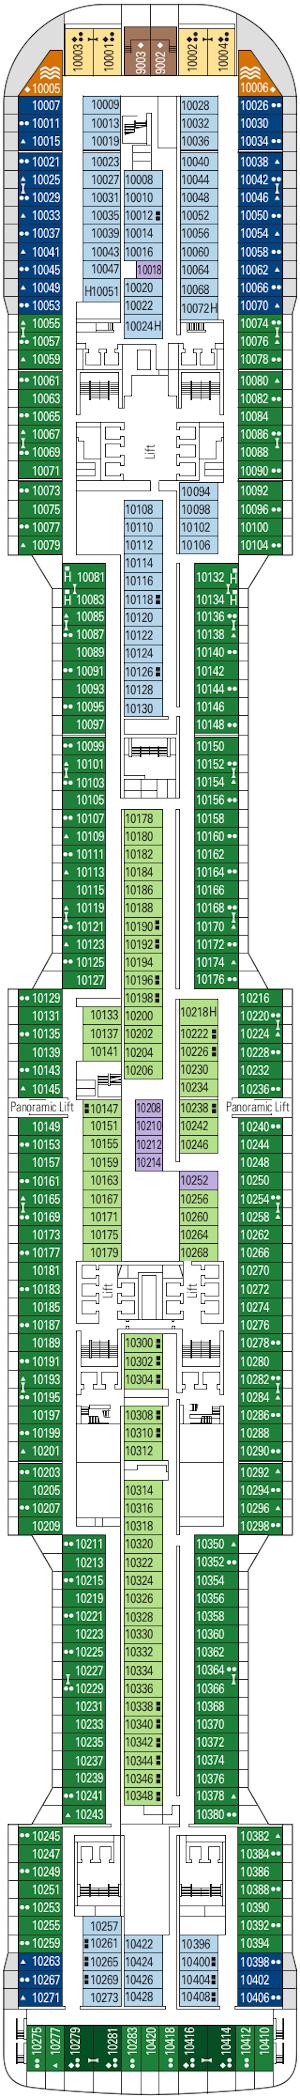 Msc Grandiosa Deck Ten Deck Plan